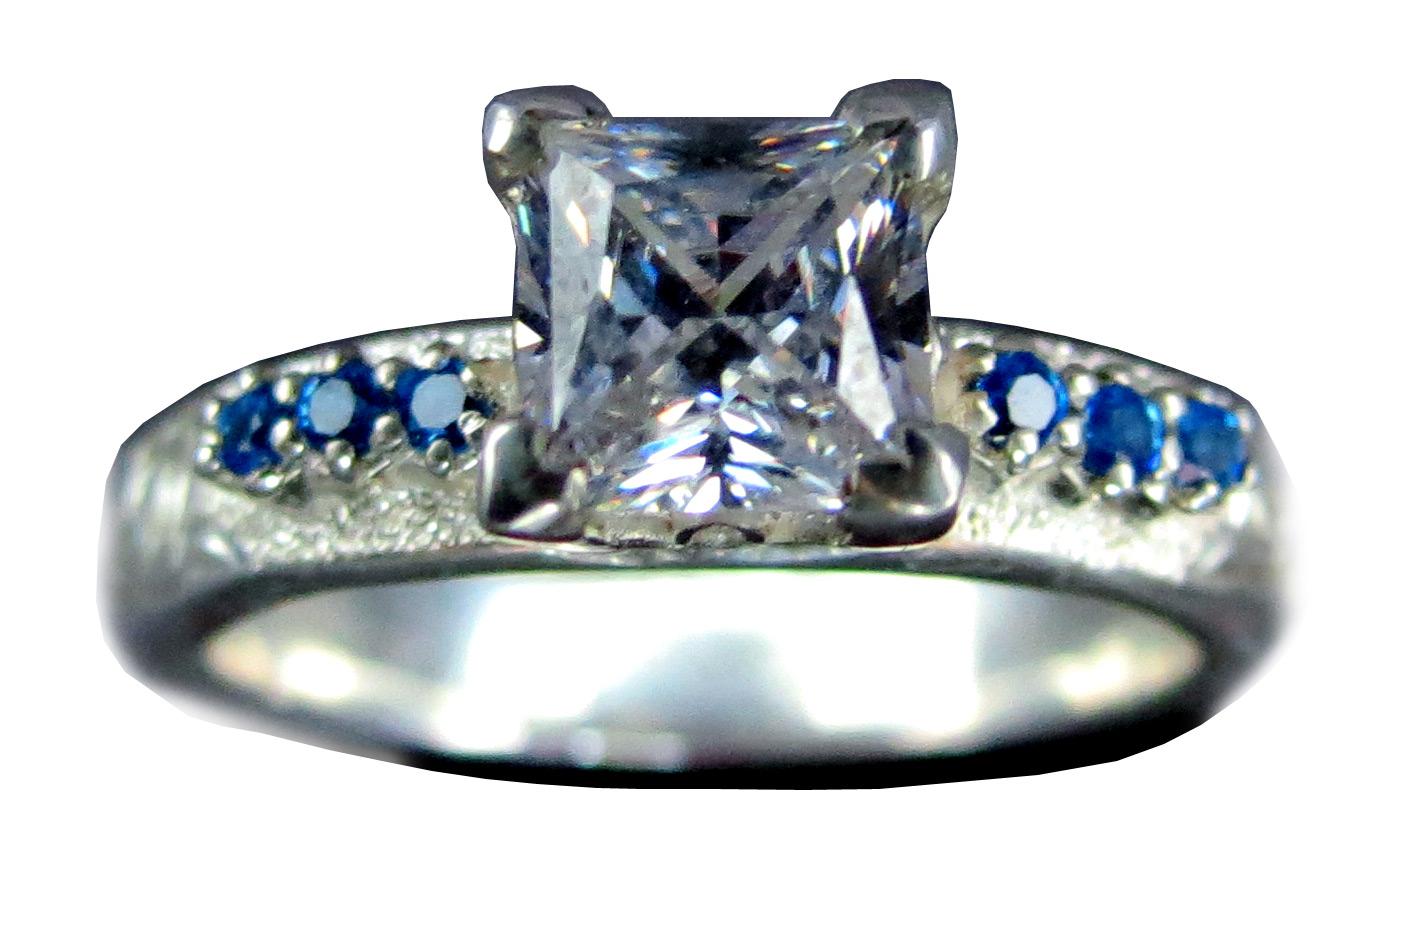 cowboyjewelers western style wedding rings rodeo jewelry western jewelry ranch brand jewelry cowboy artist swosu regina smart star berry band regina smart starberry band starberry jewelry